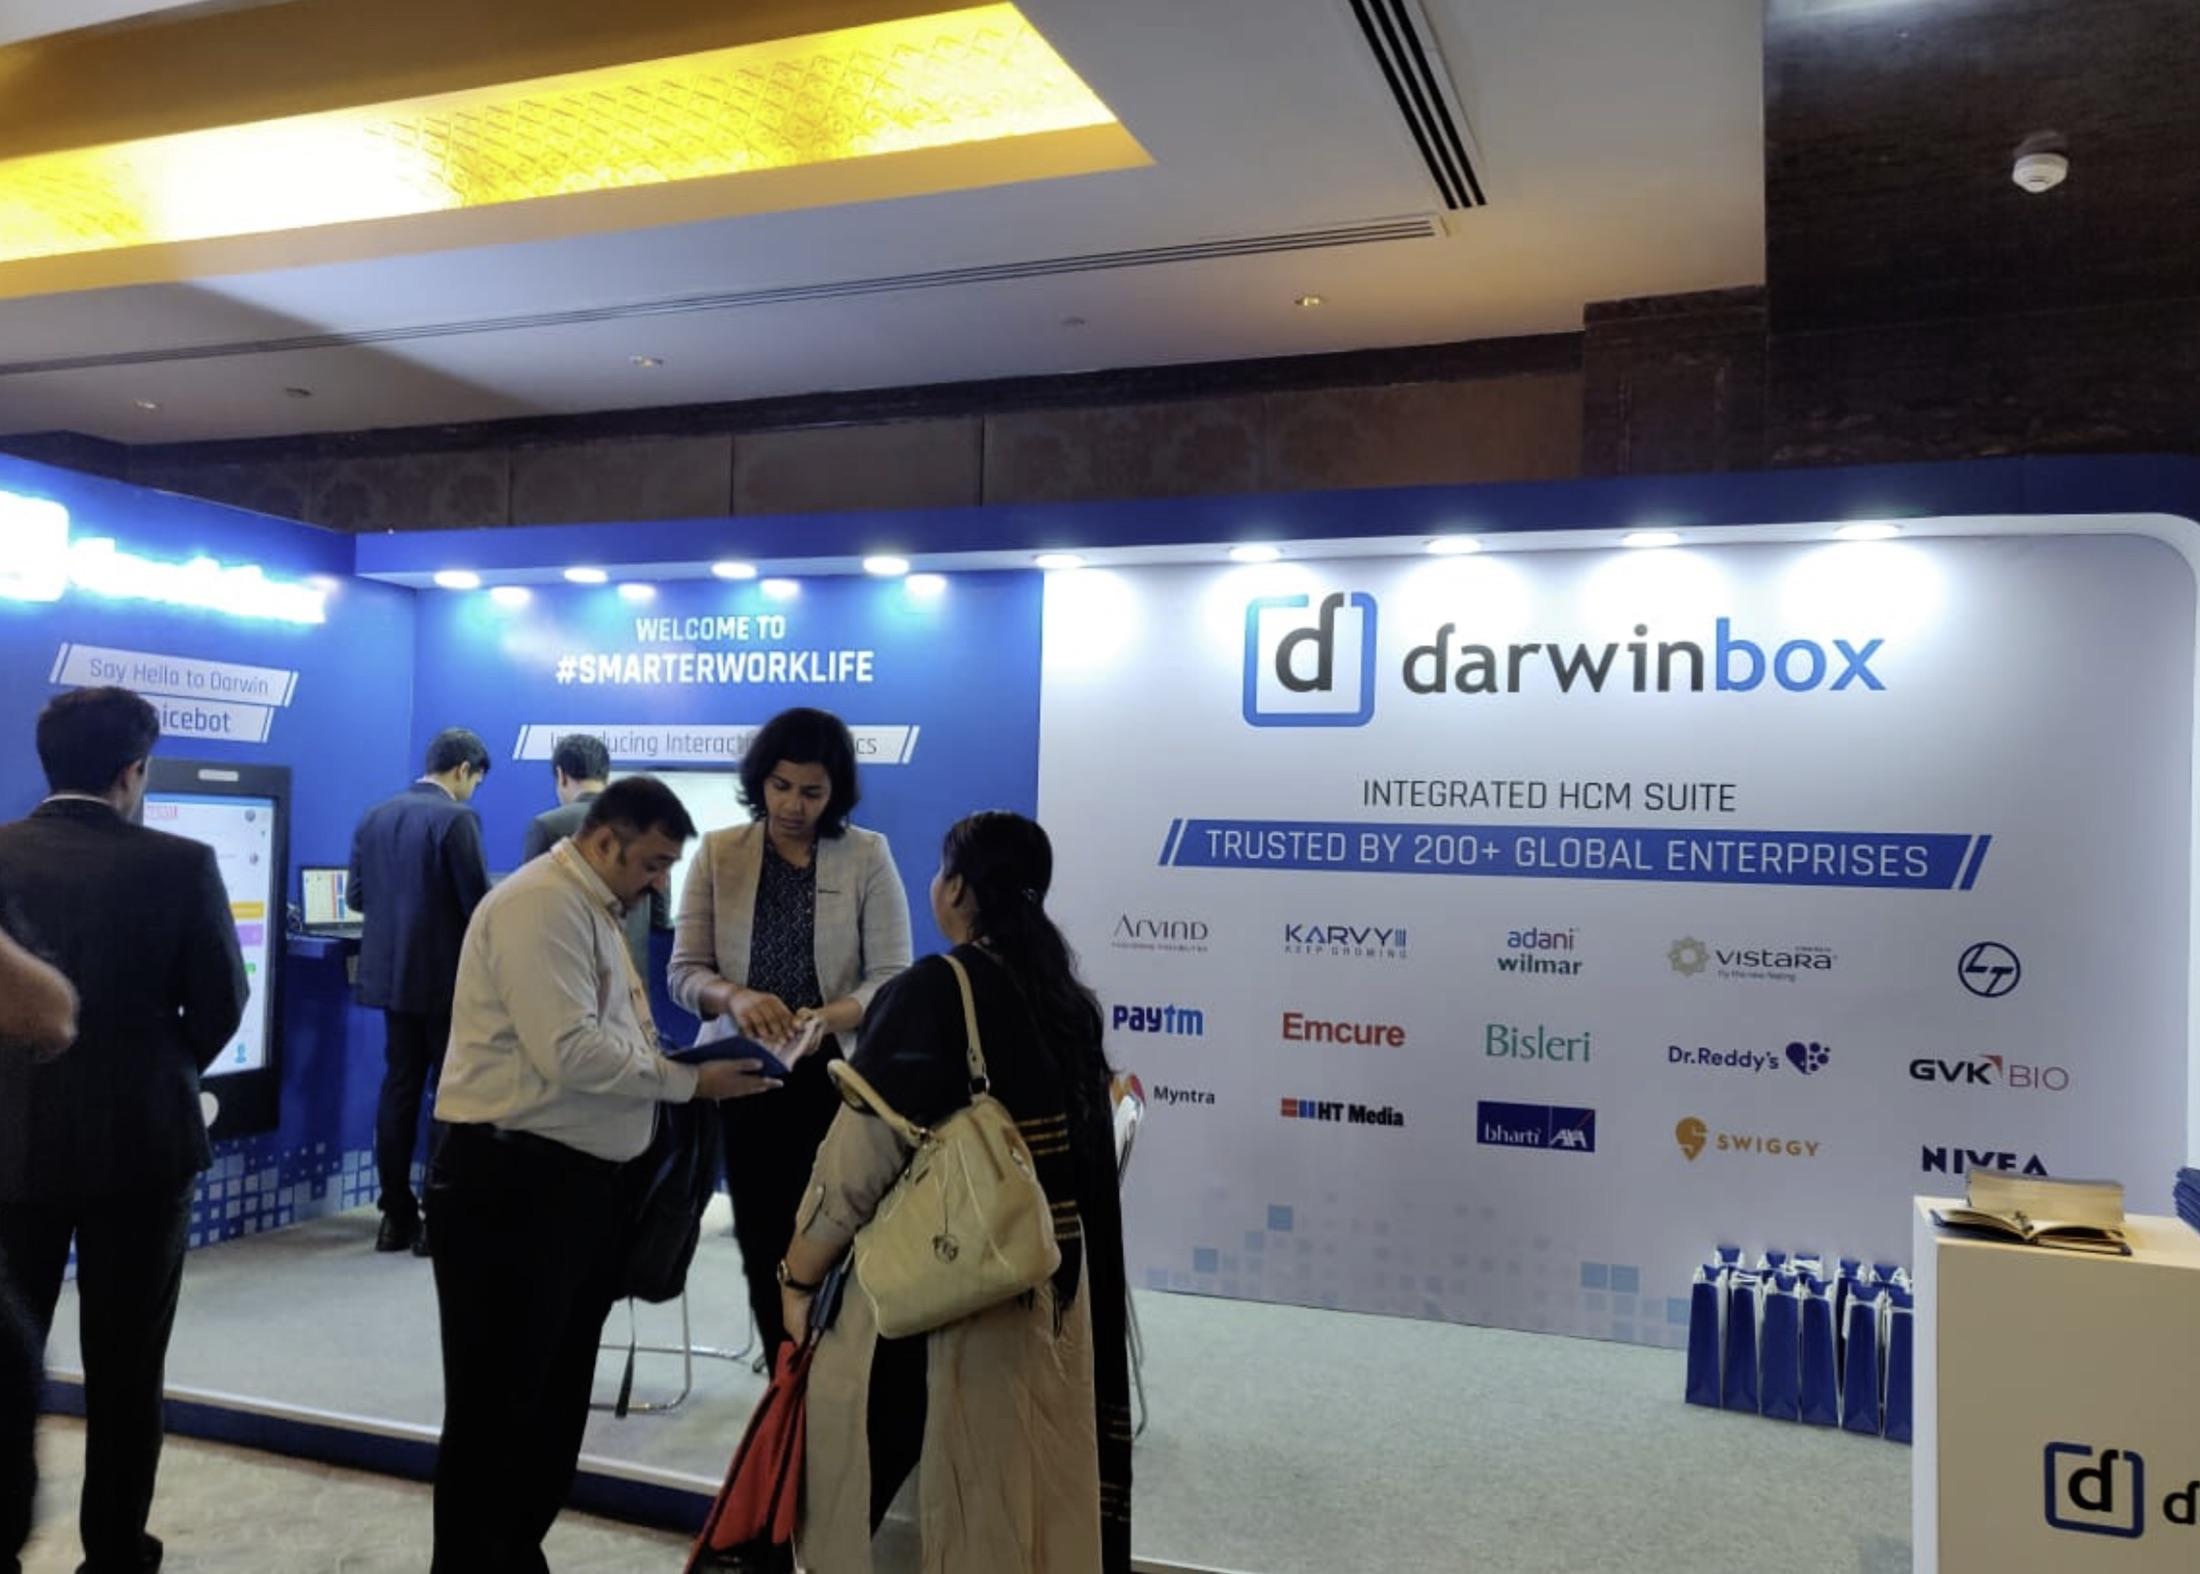 darwinbox event